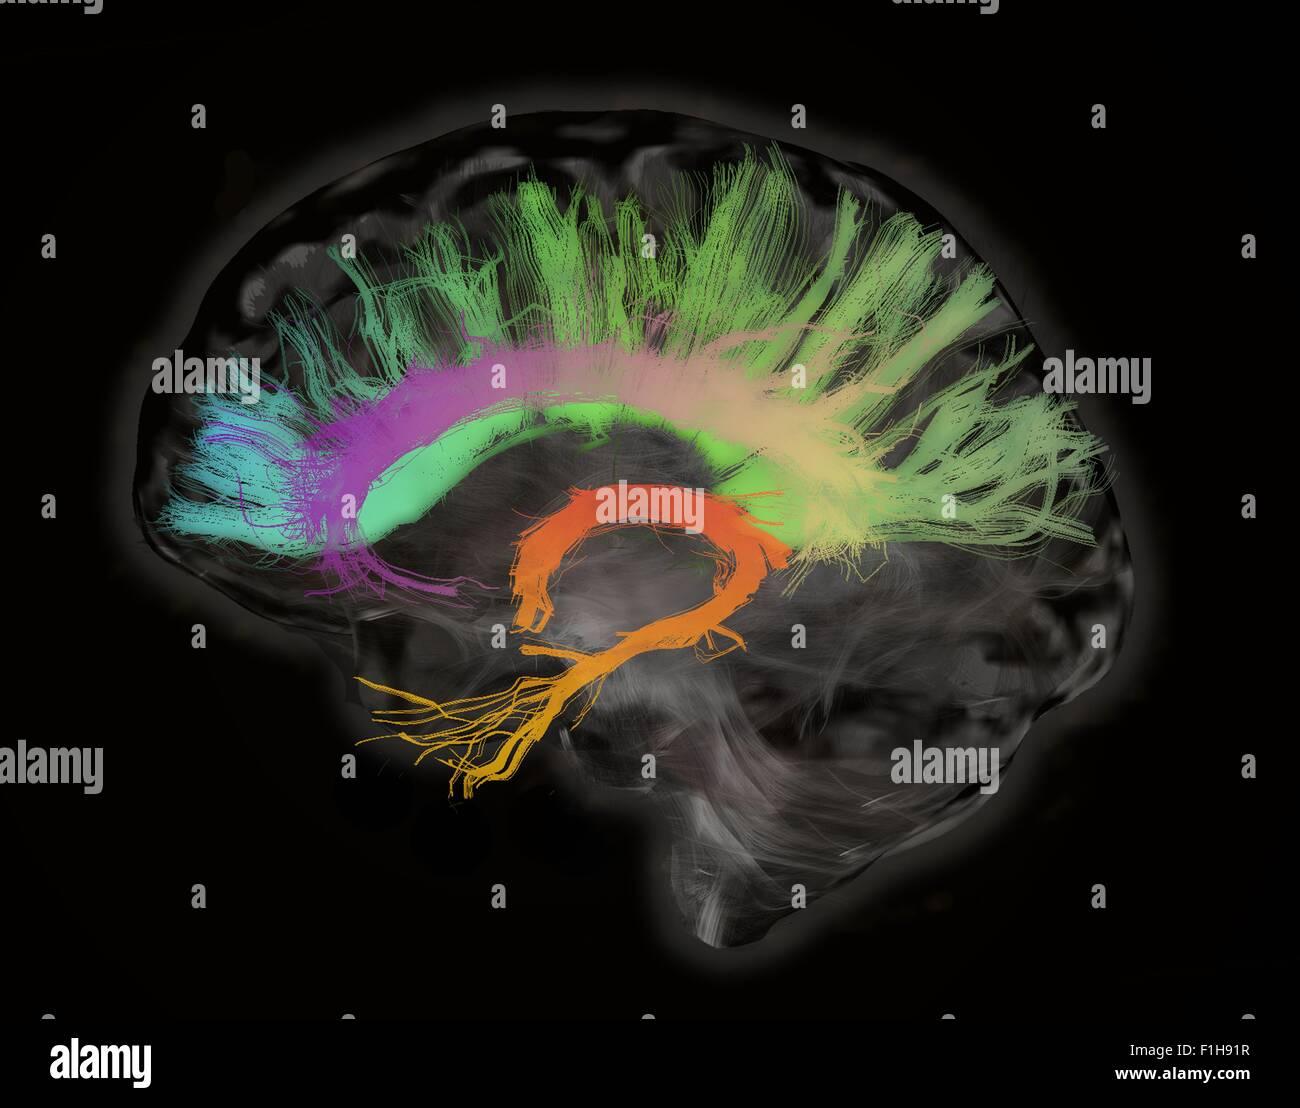 The fiber tracts involved aging. splenium genu corpus callosum fornix cingulum bundle. Human subject - Stock Image